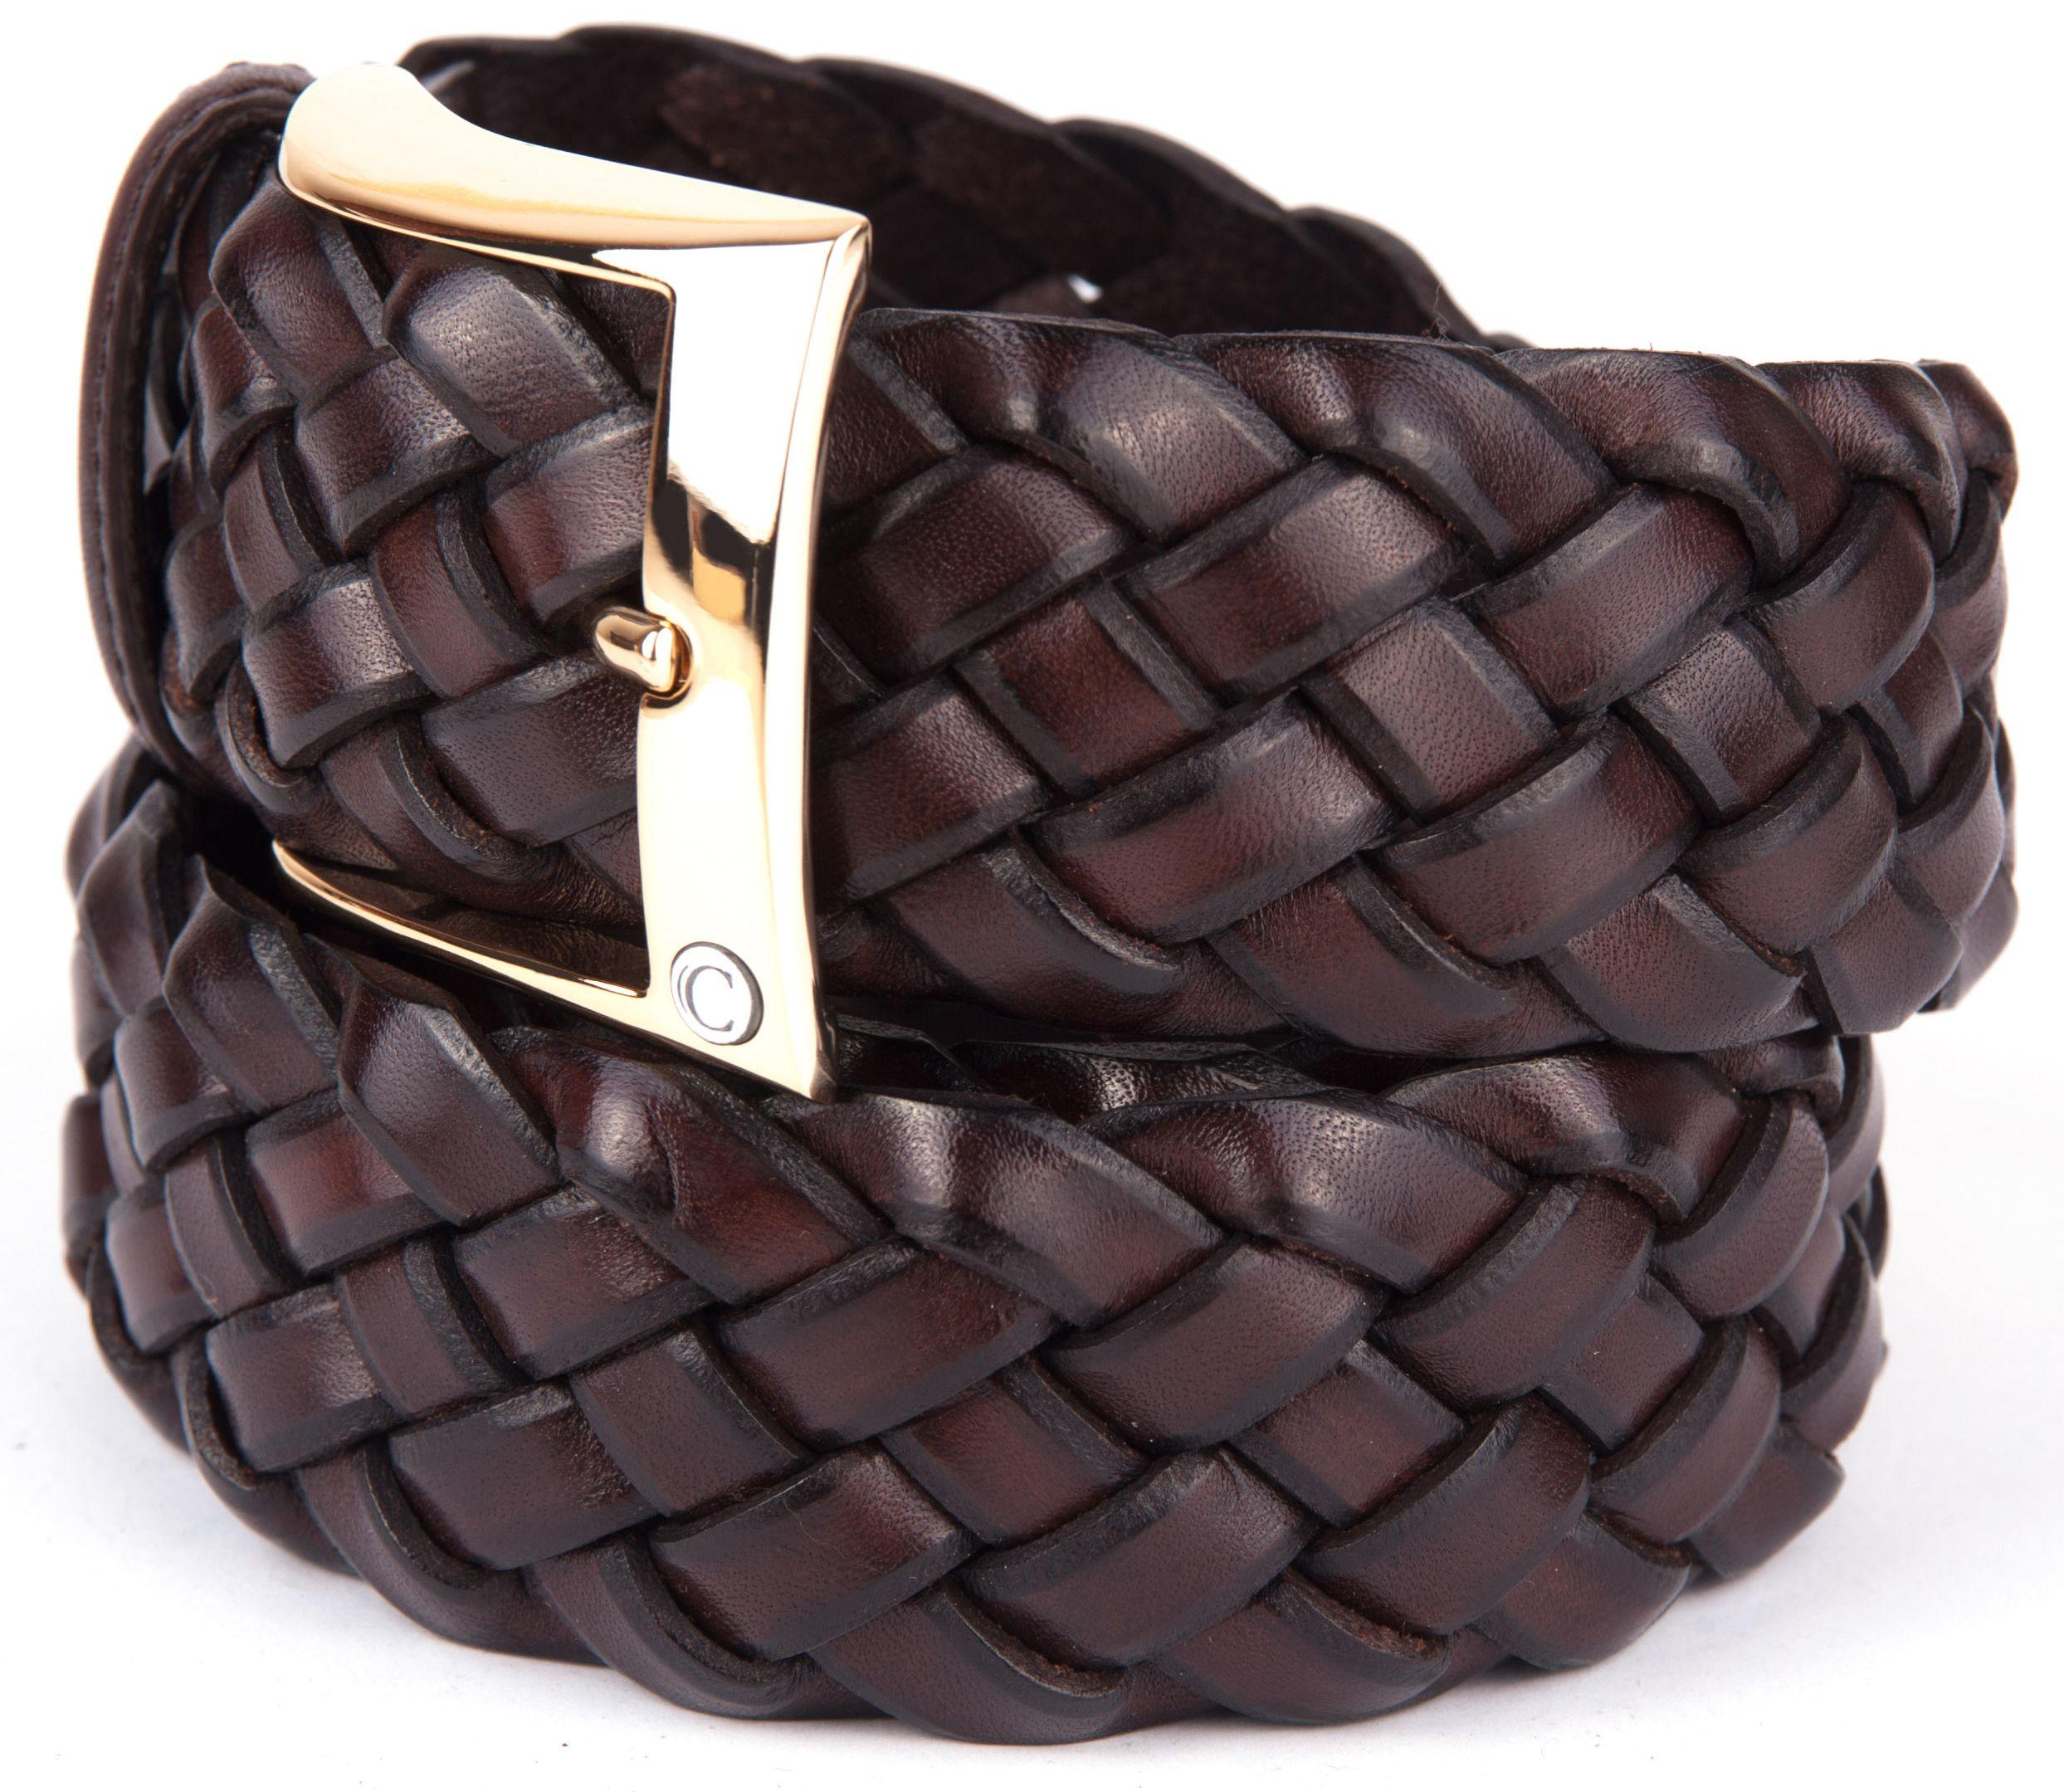 Casual Intrecciato Twisted Leather Men's Belt